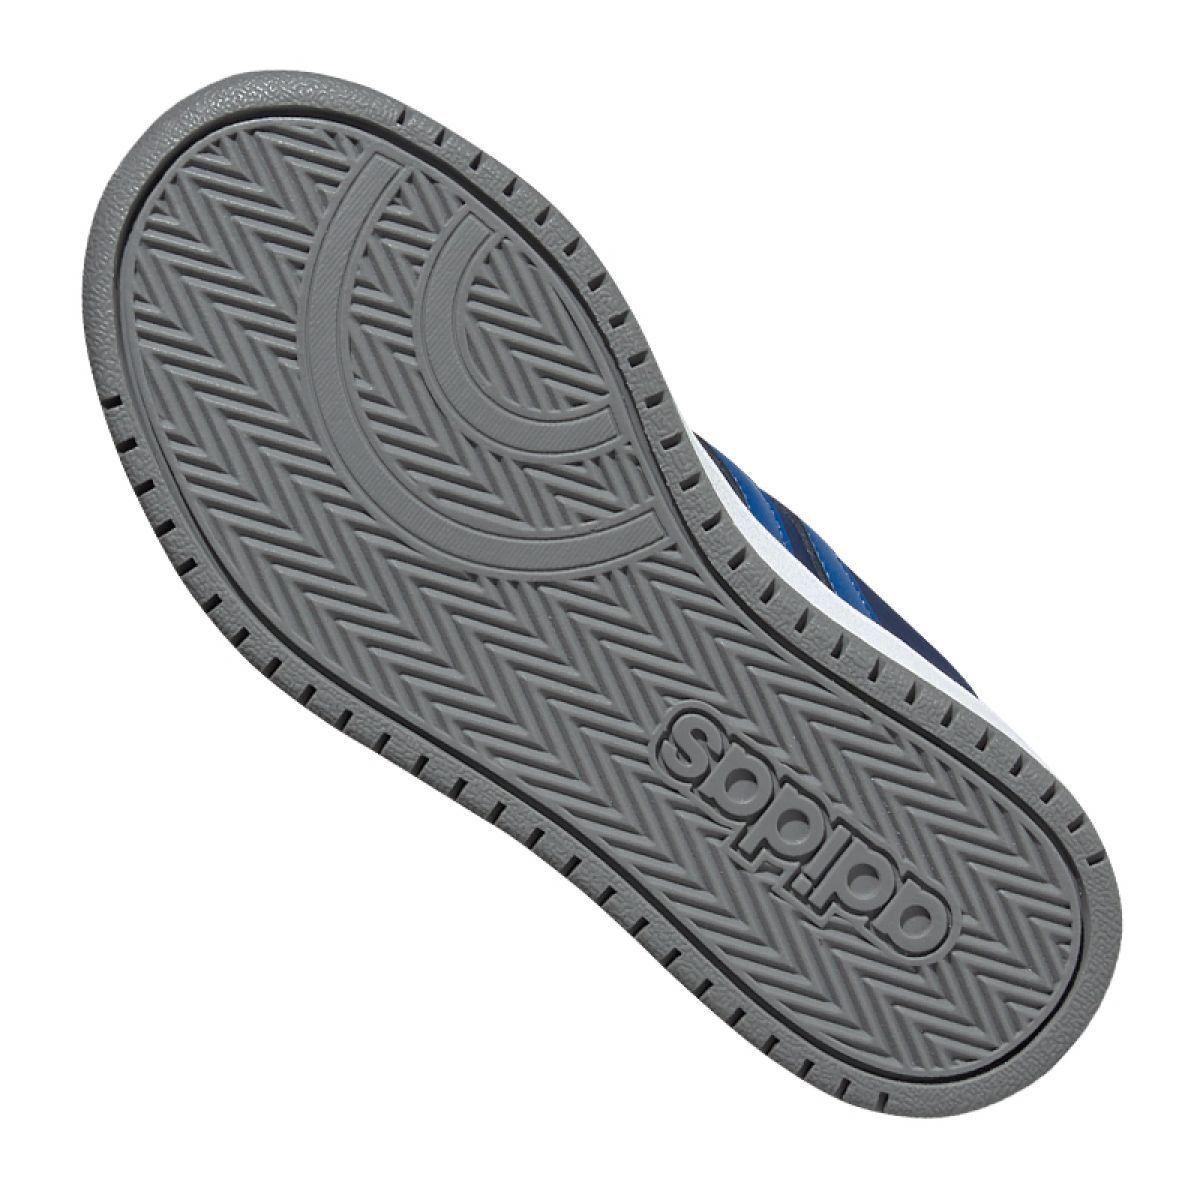 Adidas V Jog K Jr Aw4147 Shoes Grey Adidas Brand Jogging Sports Shoes Adidas